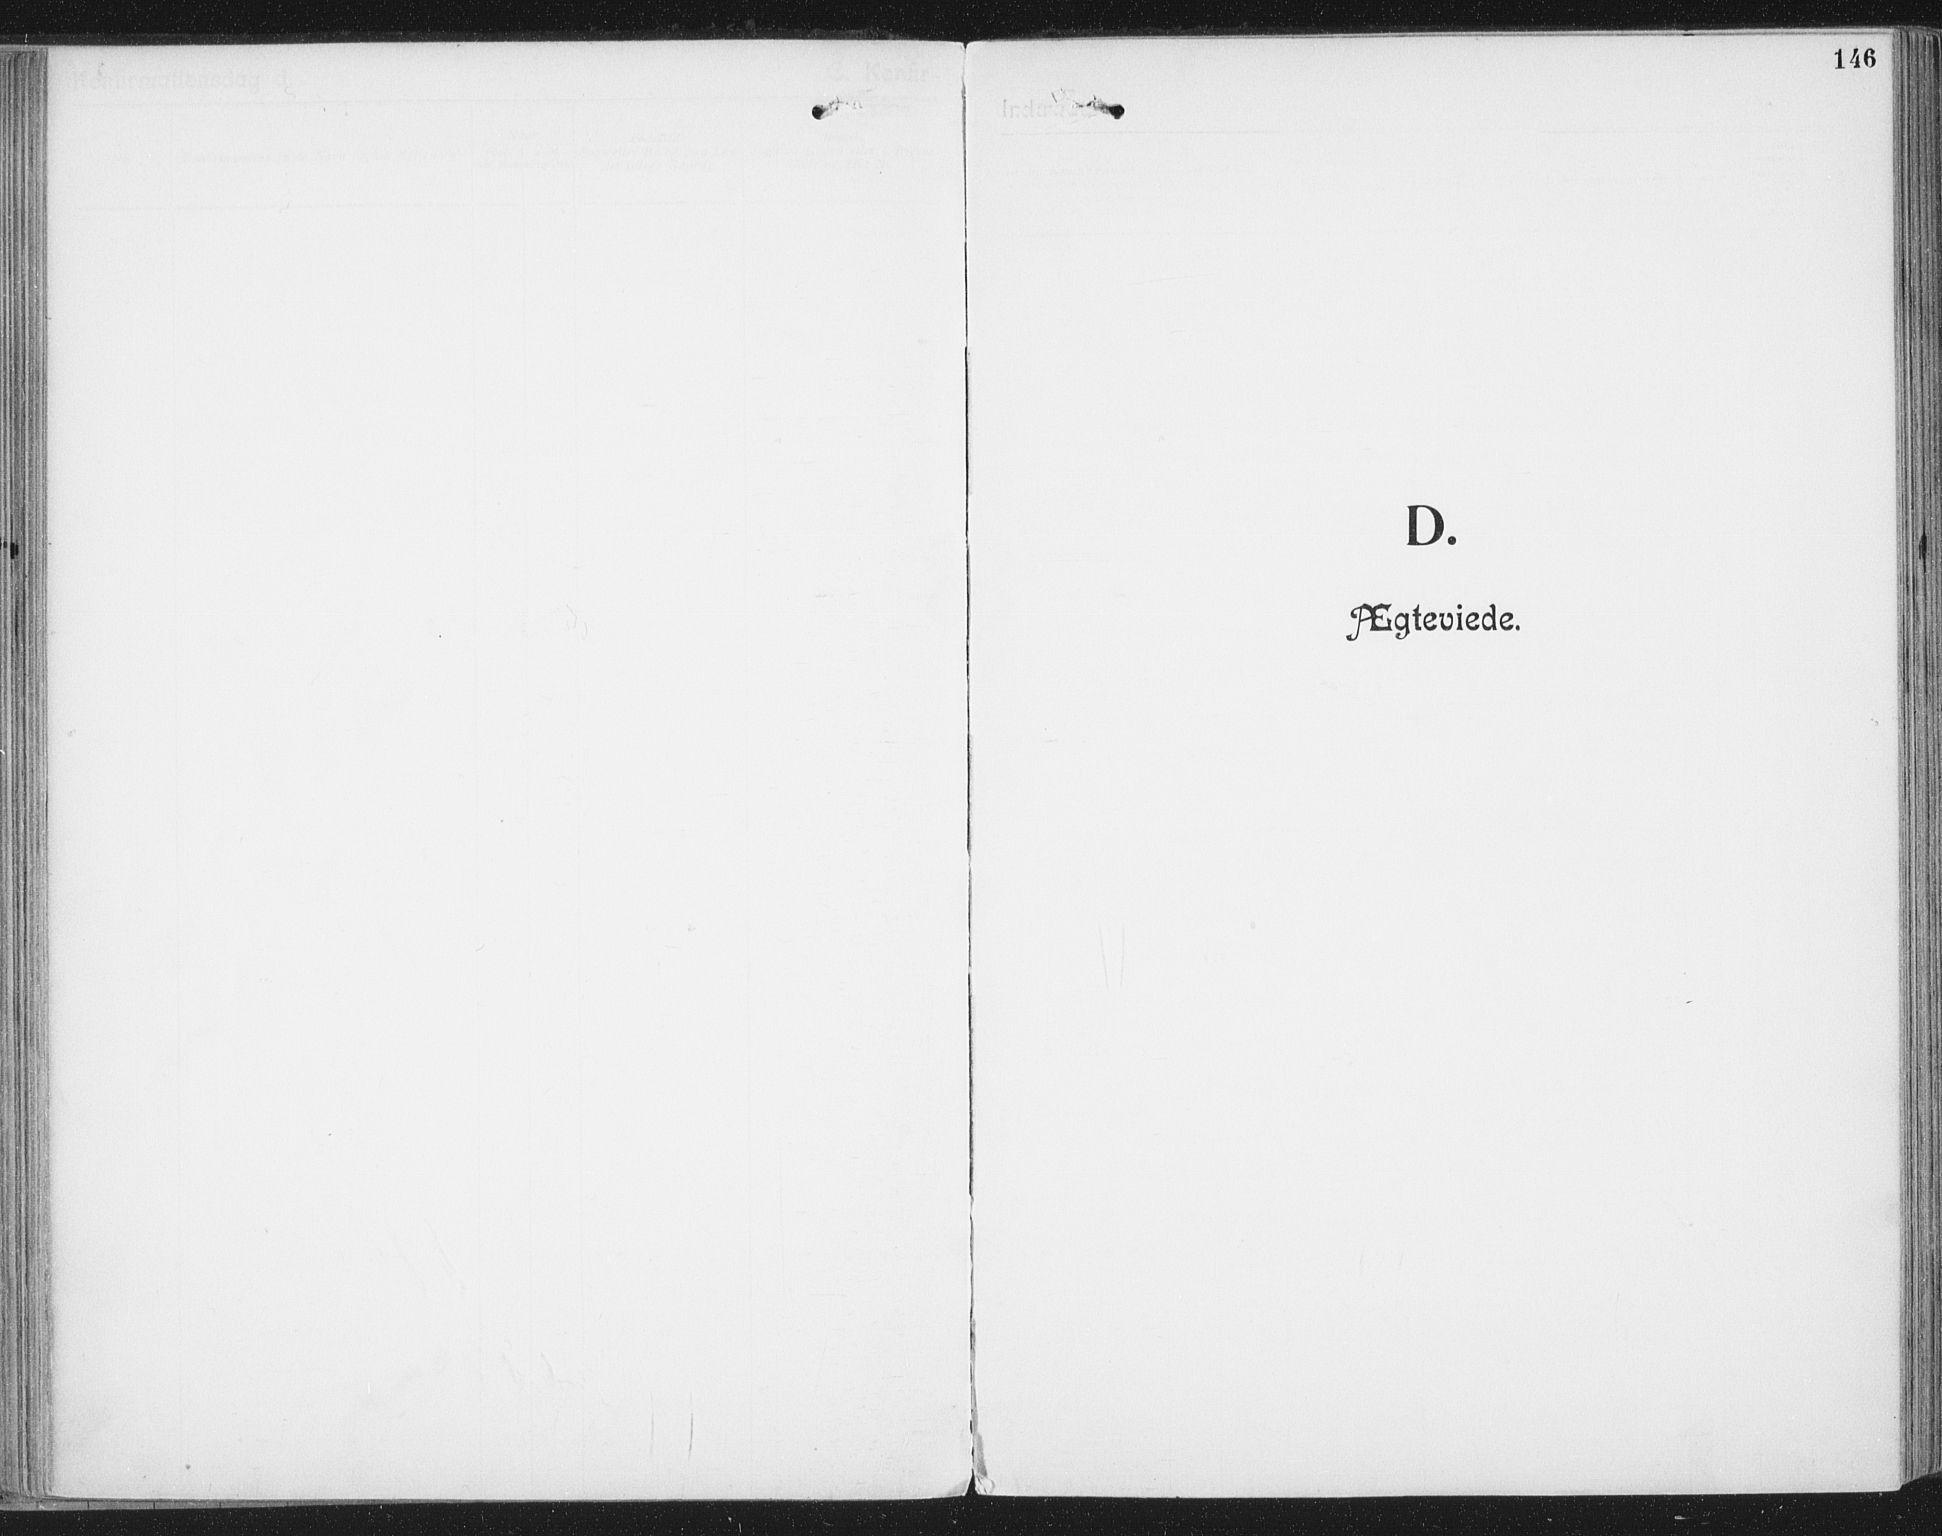 SAT, Ministerialprotokoller, klokkerbøker og fødselsregistre - Nordland, 804/L0081: Ministerialbok nr. 804A02, 1901-1915, s. 146